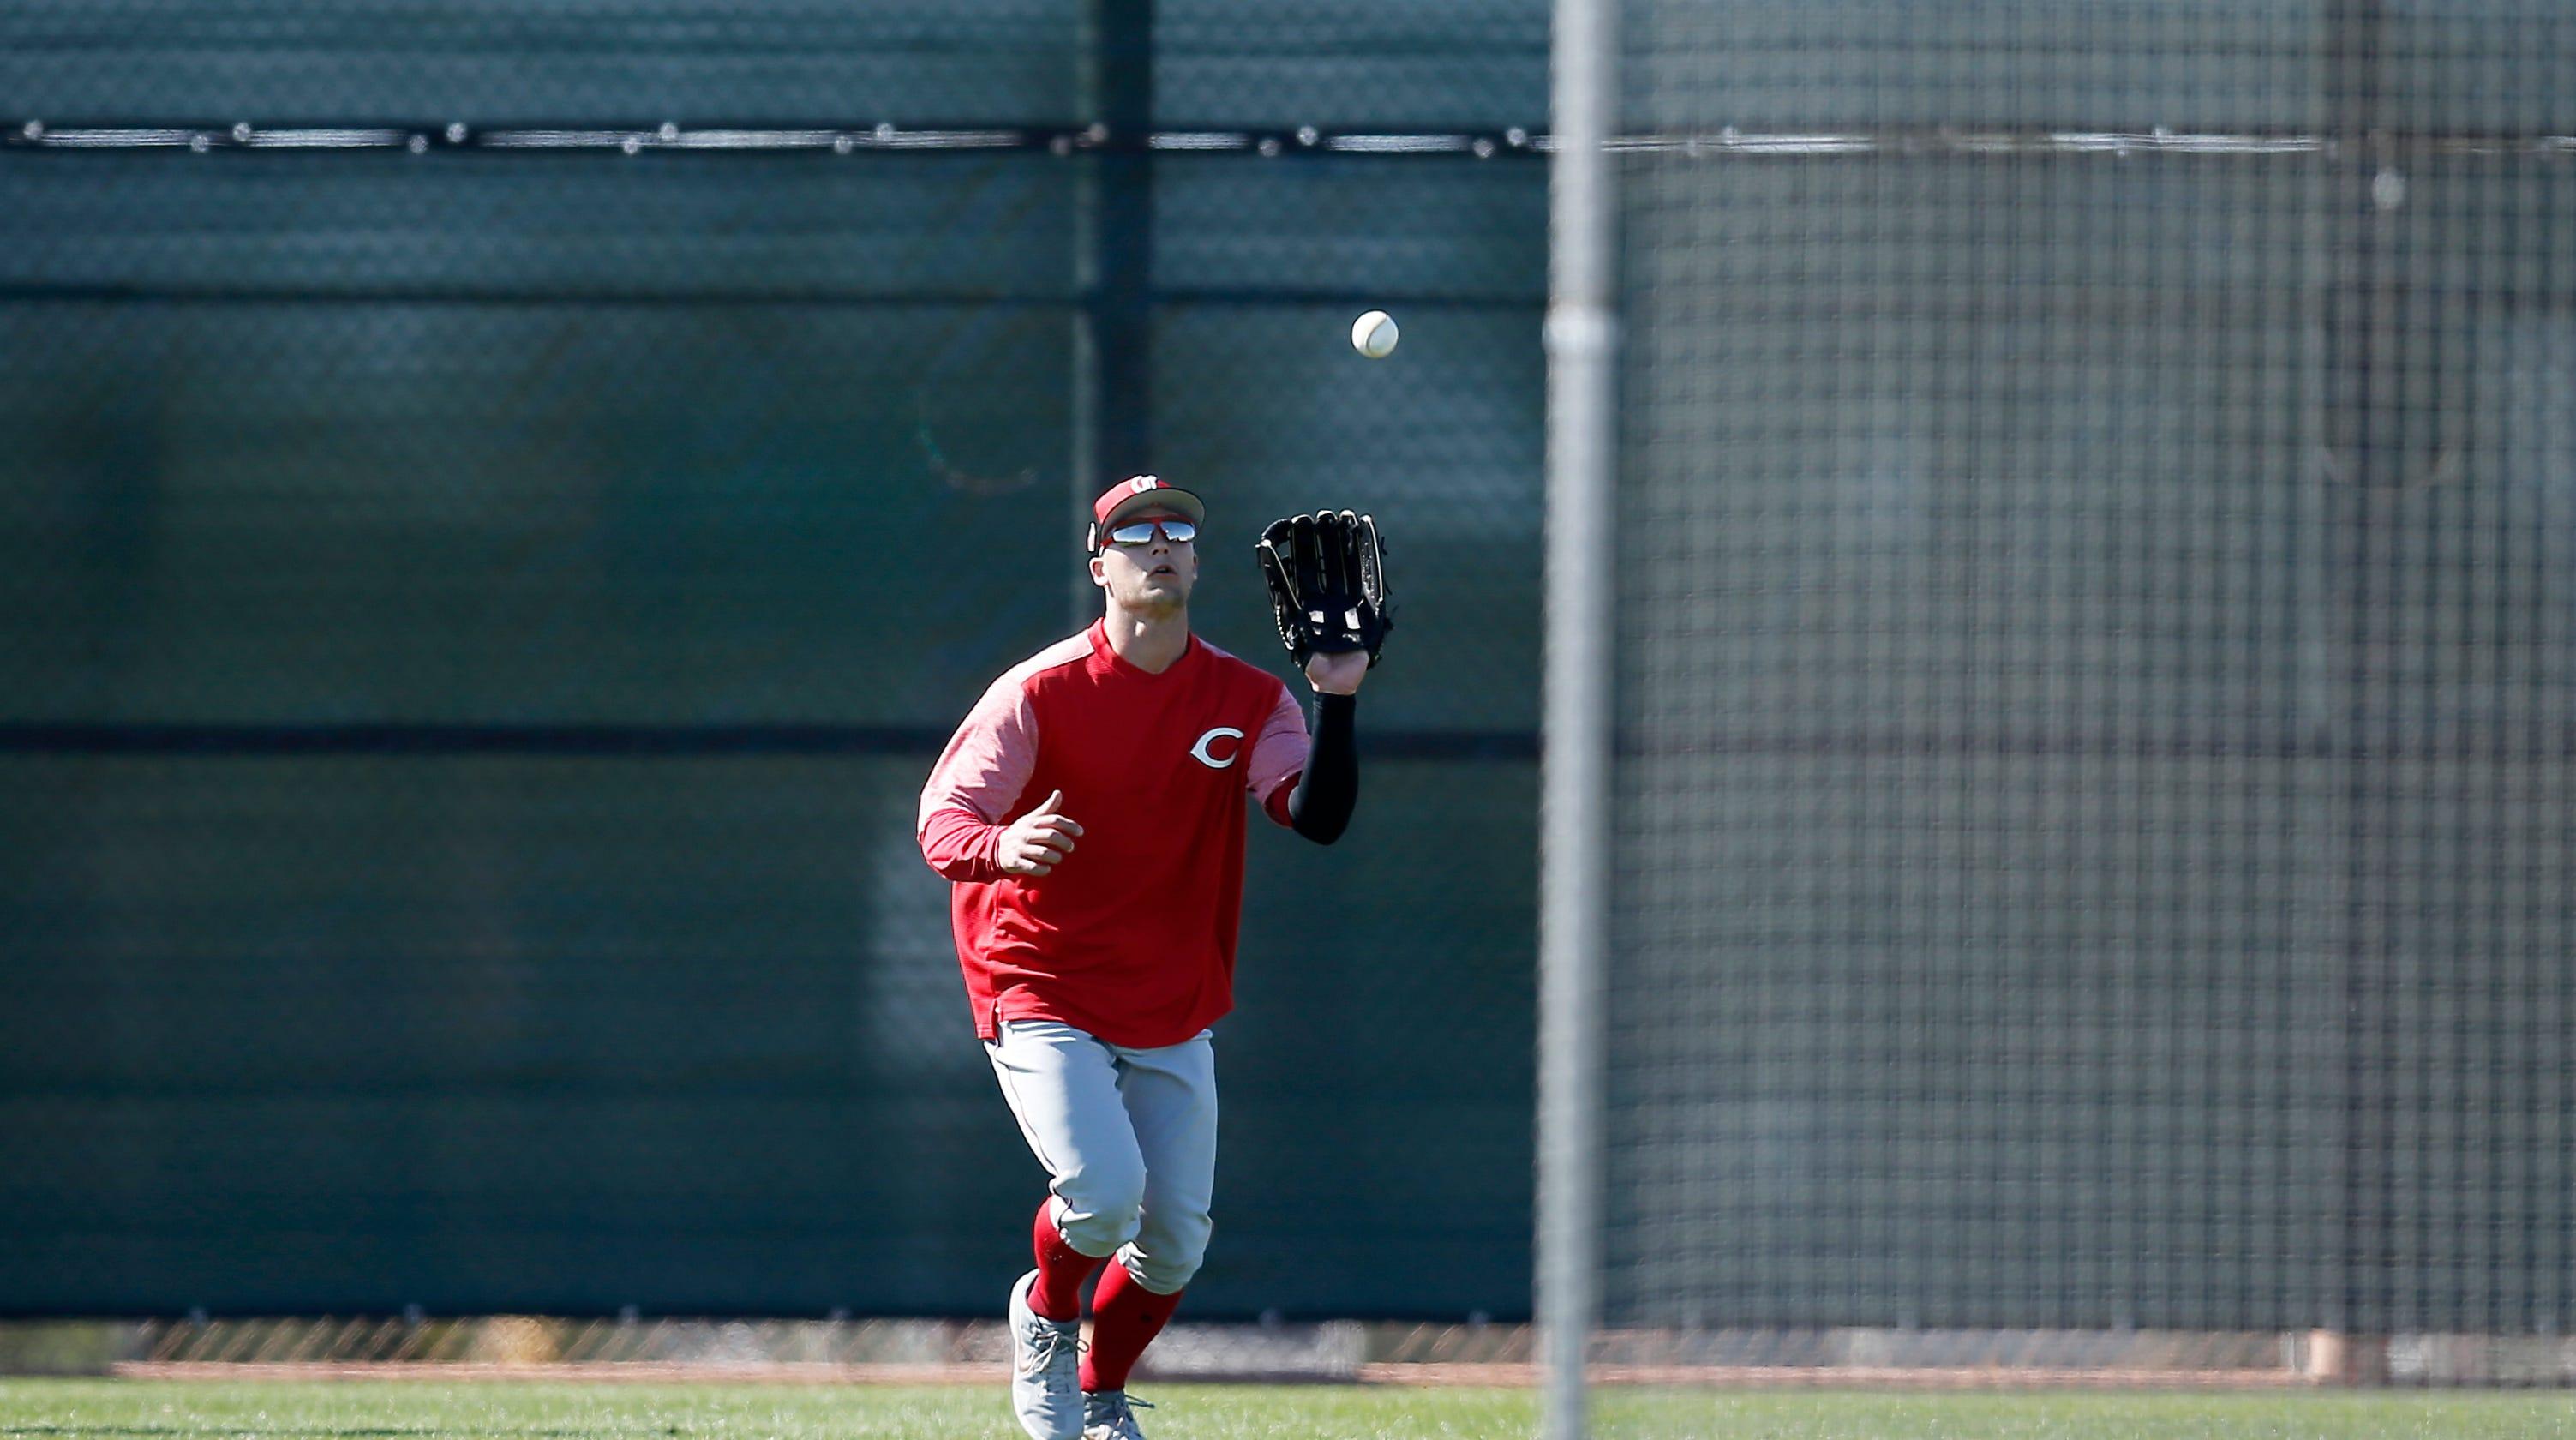 Cincinnati Reds cut 8 players, including Nick Senzel, from camp